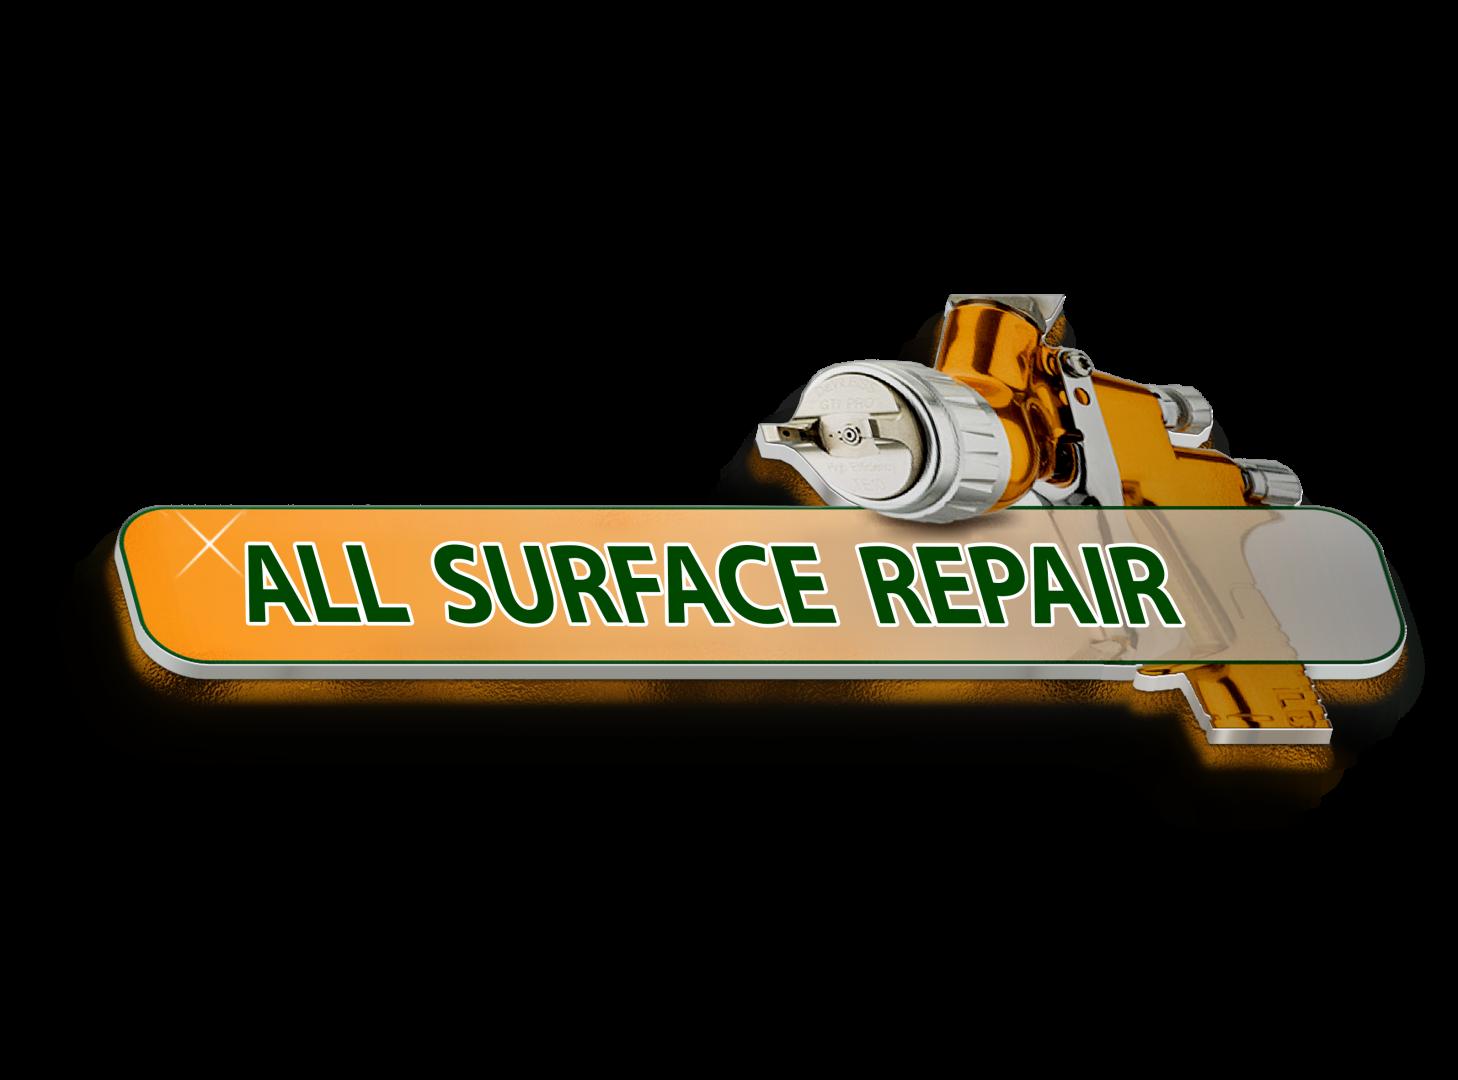 All Surface REPAIR